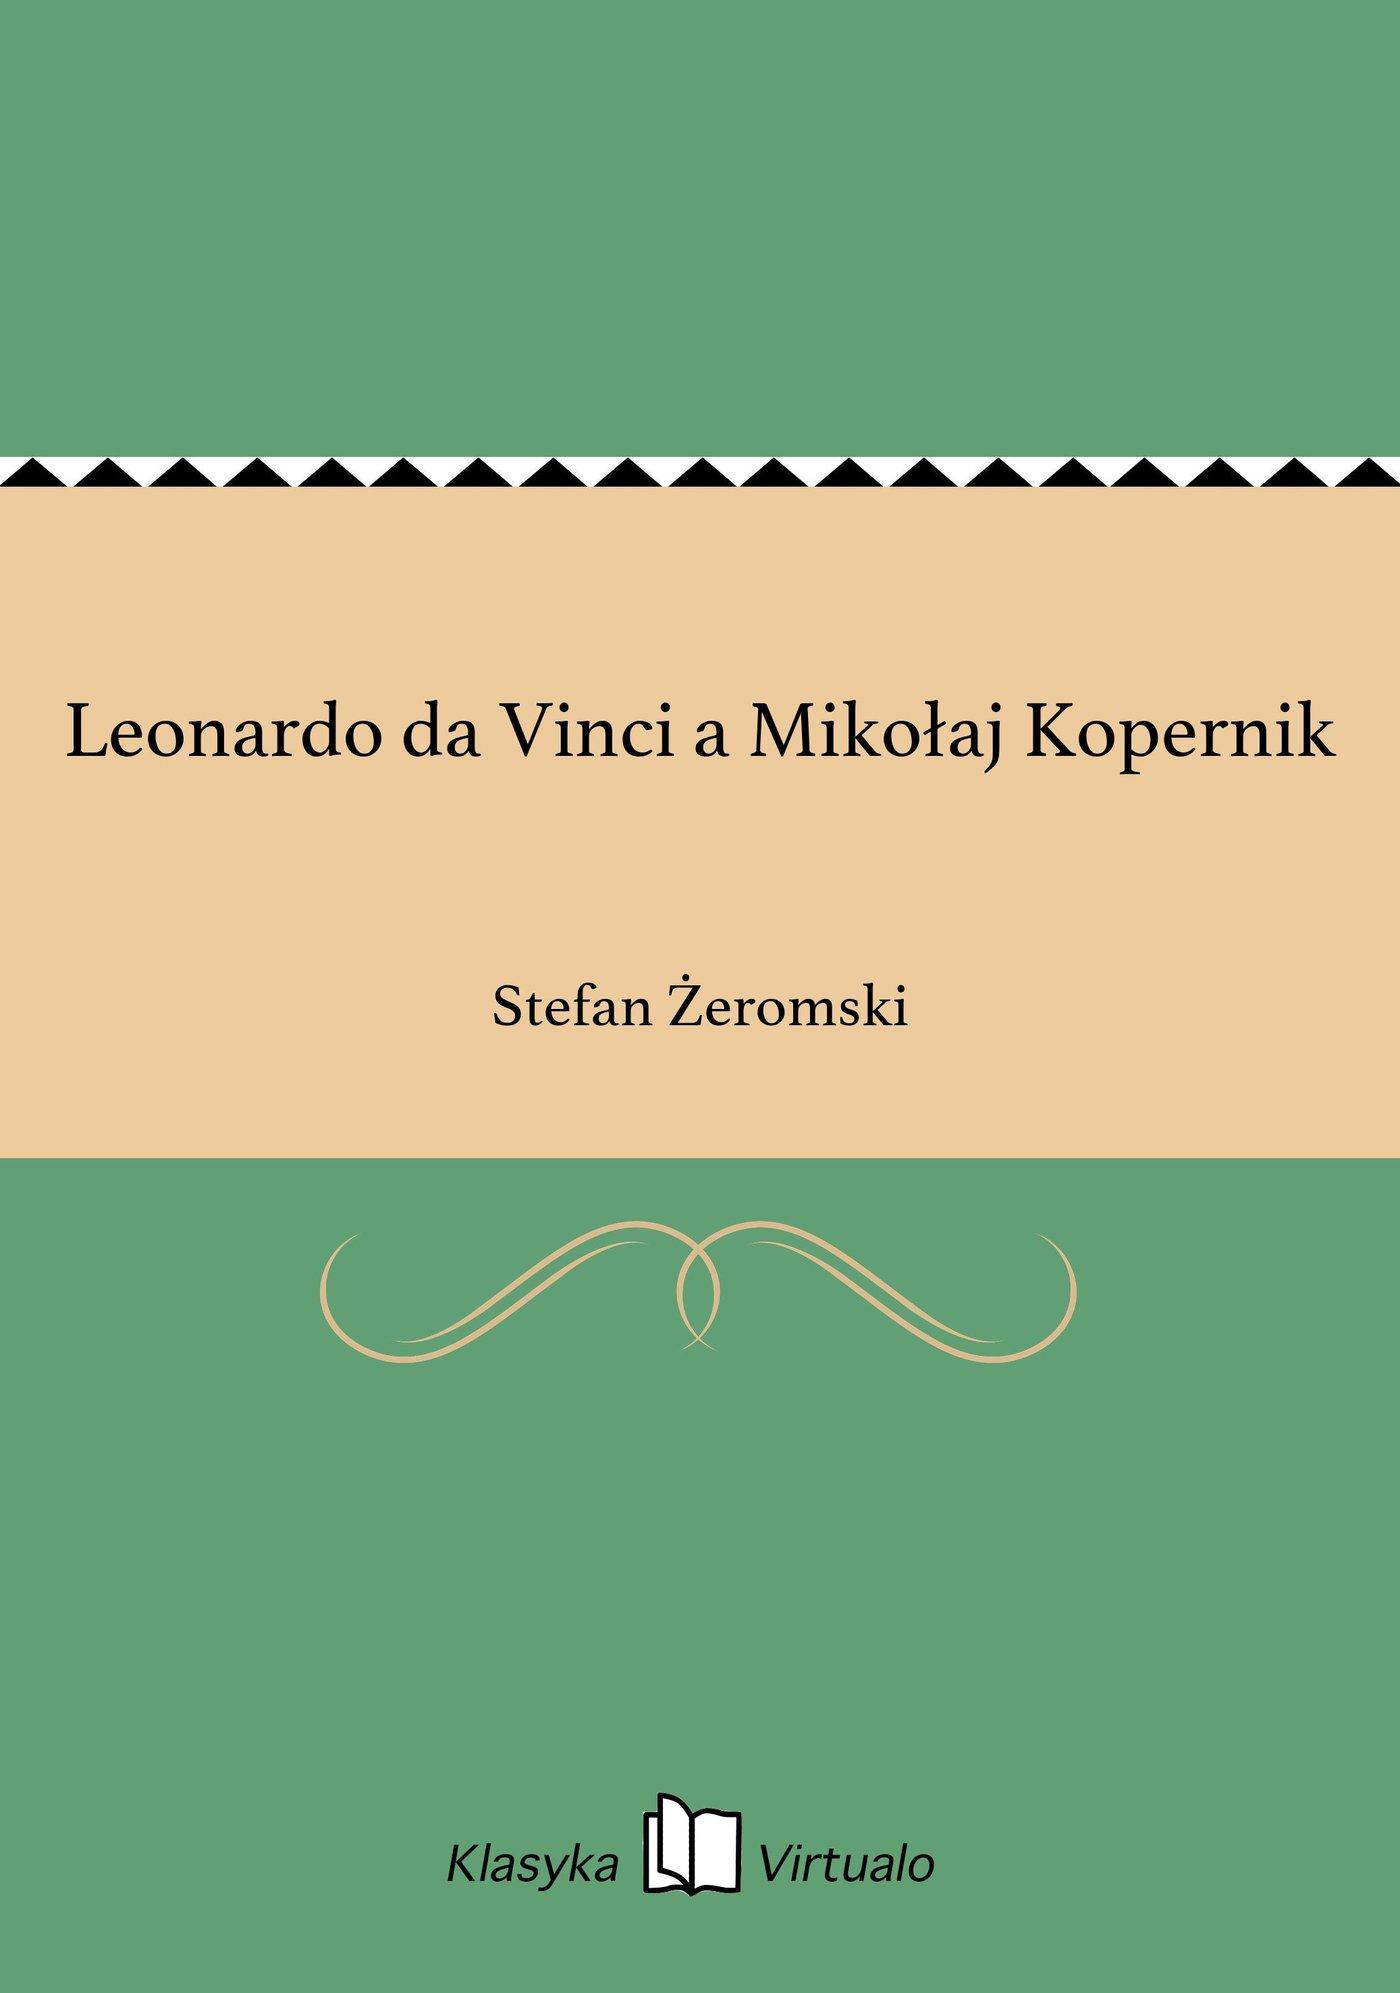 Leonardo da Vinci a Mikołaj Kopernik - Ebook (Książka EPUB) do pobrania w formacie EPUB